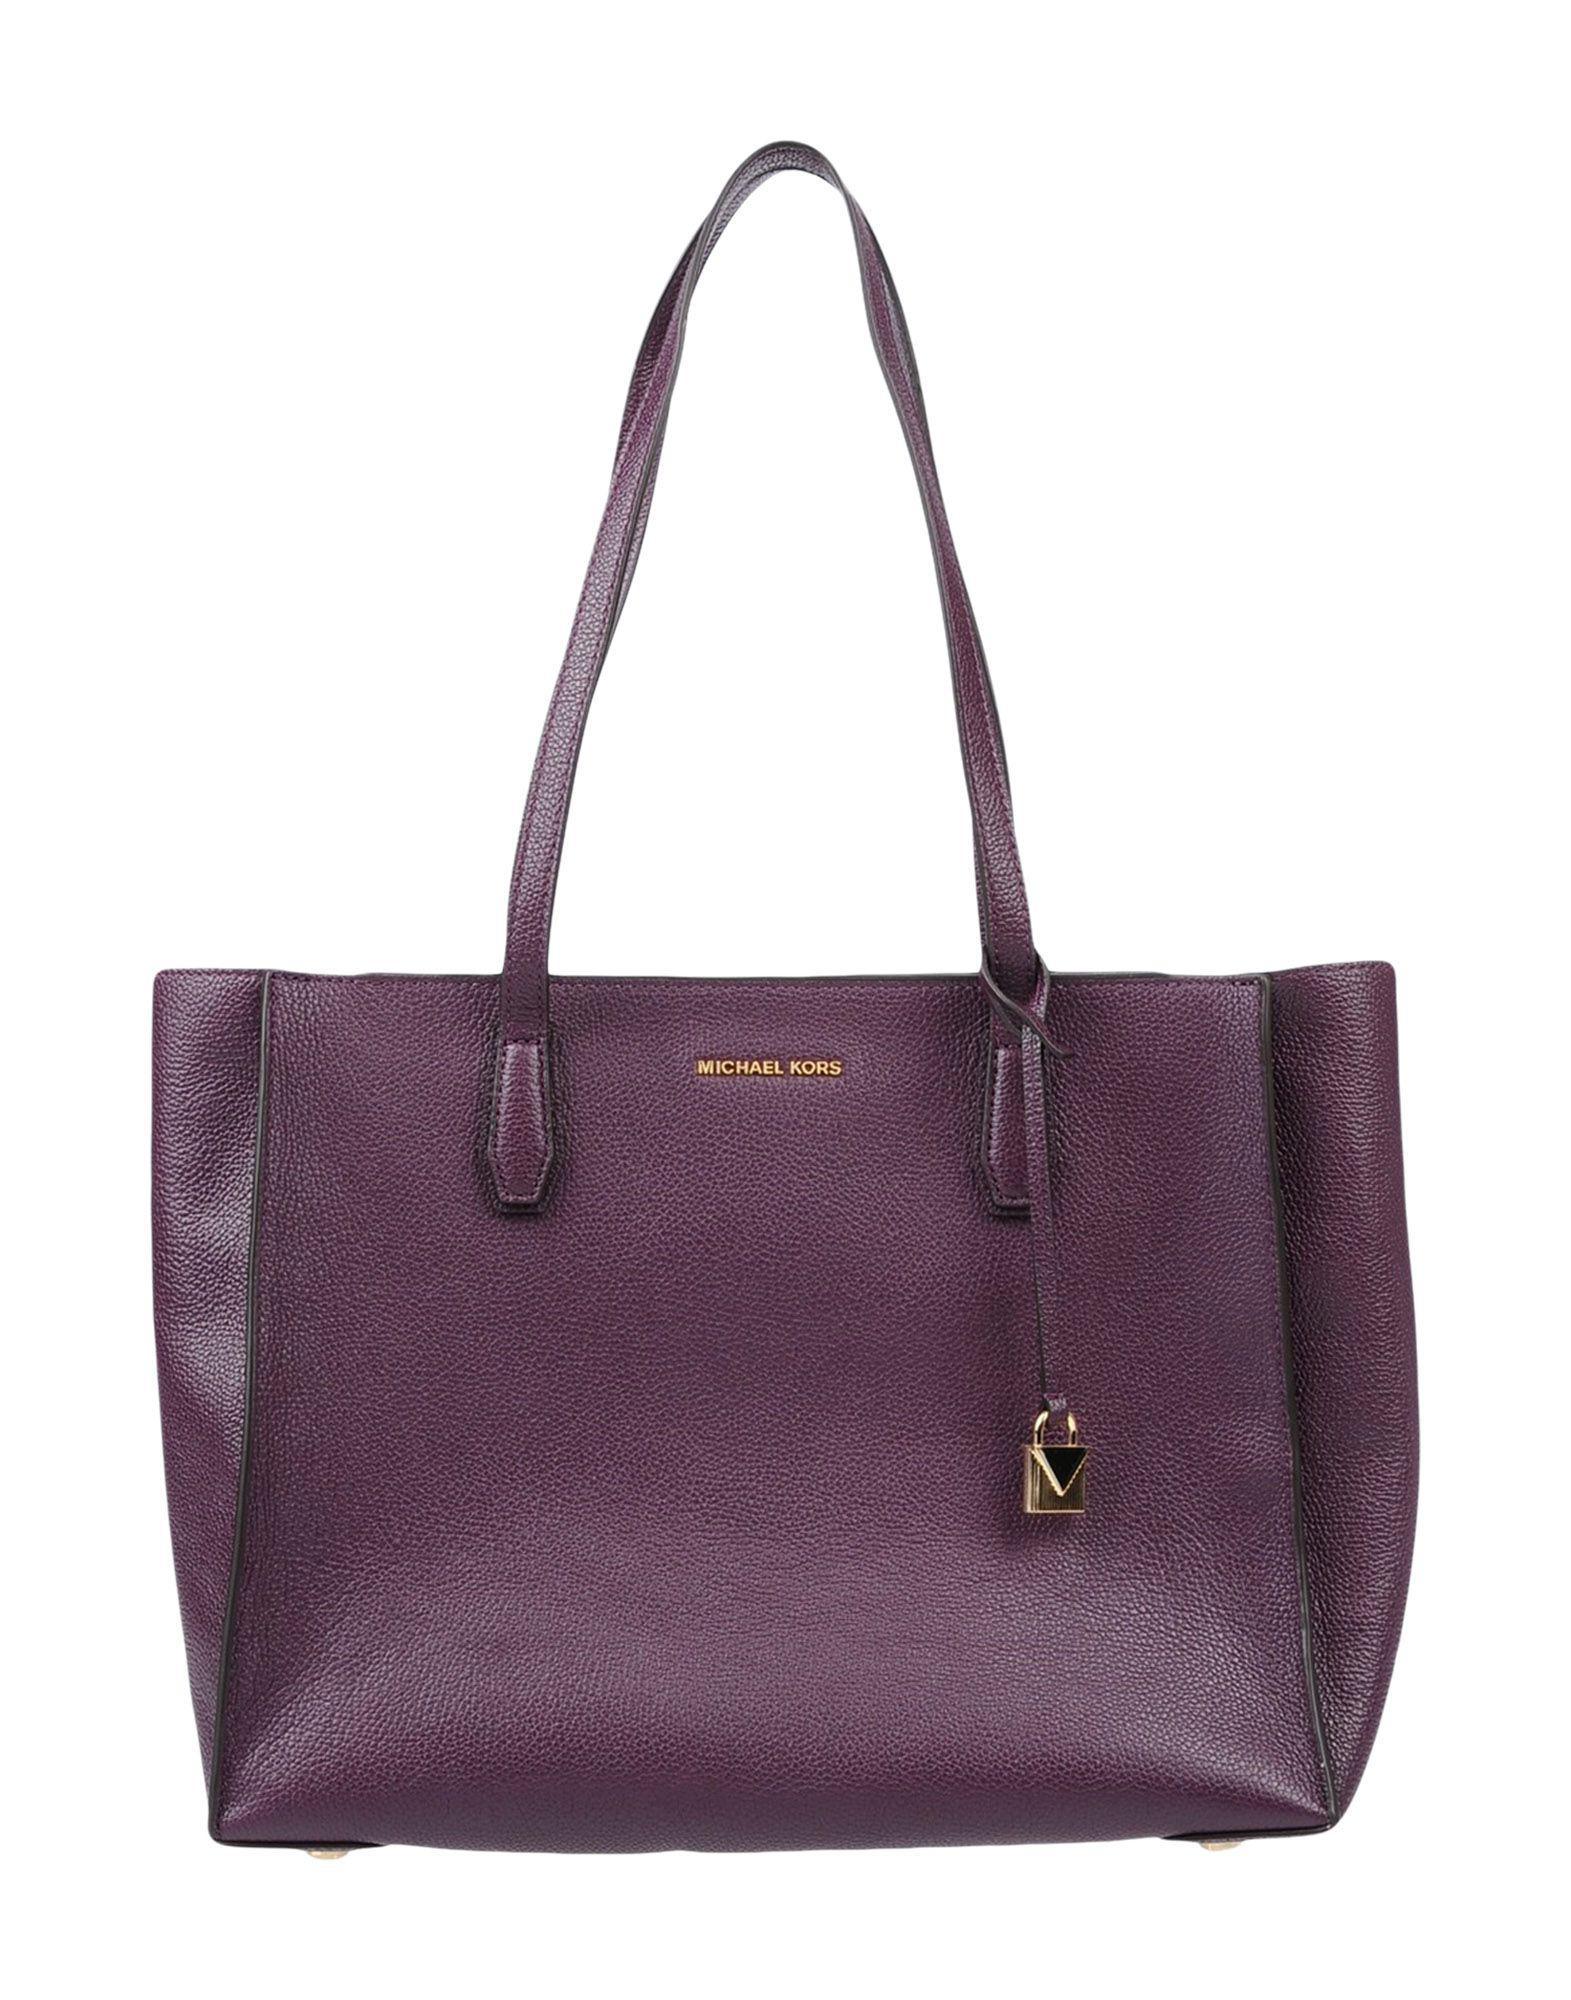 Kors Bolso Asas Largas Purple De Michael Color OZkiuXPT